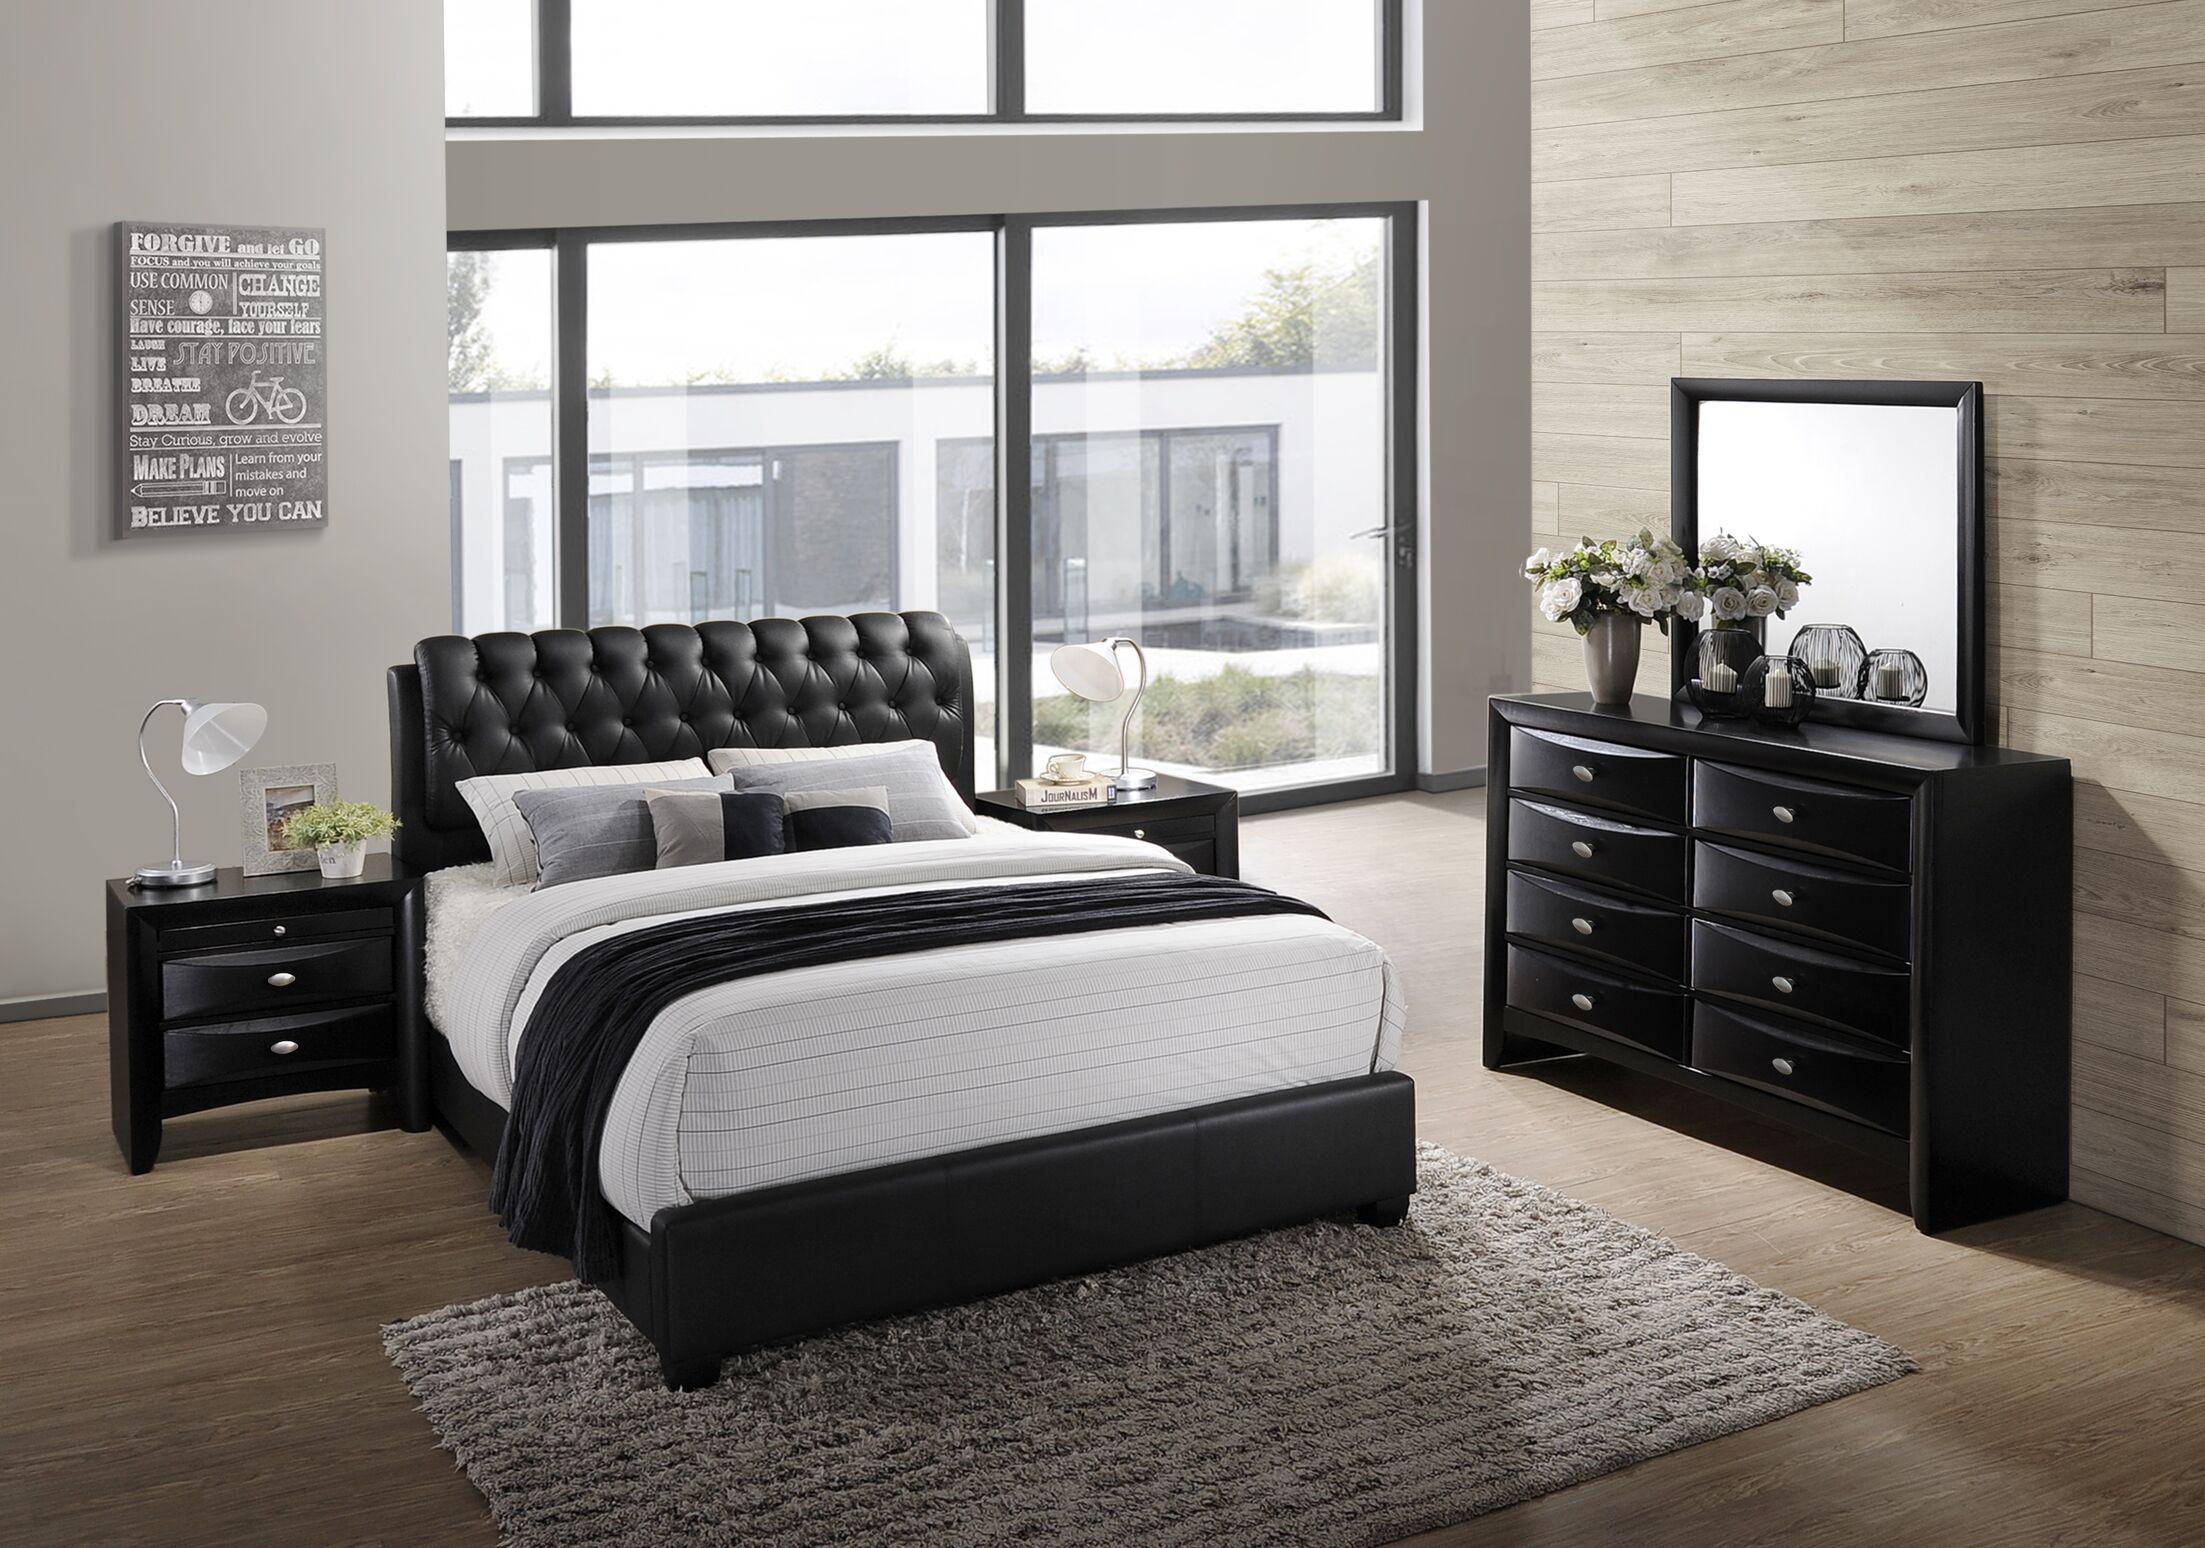 Blemerey 5 Piece Bedroom Set Size: King